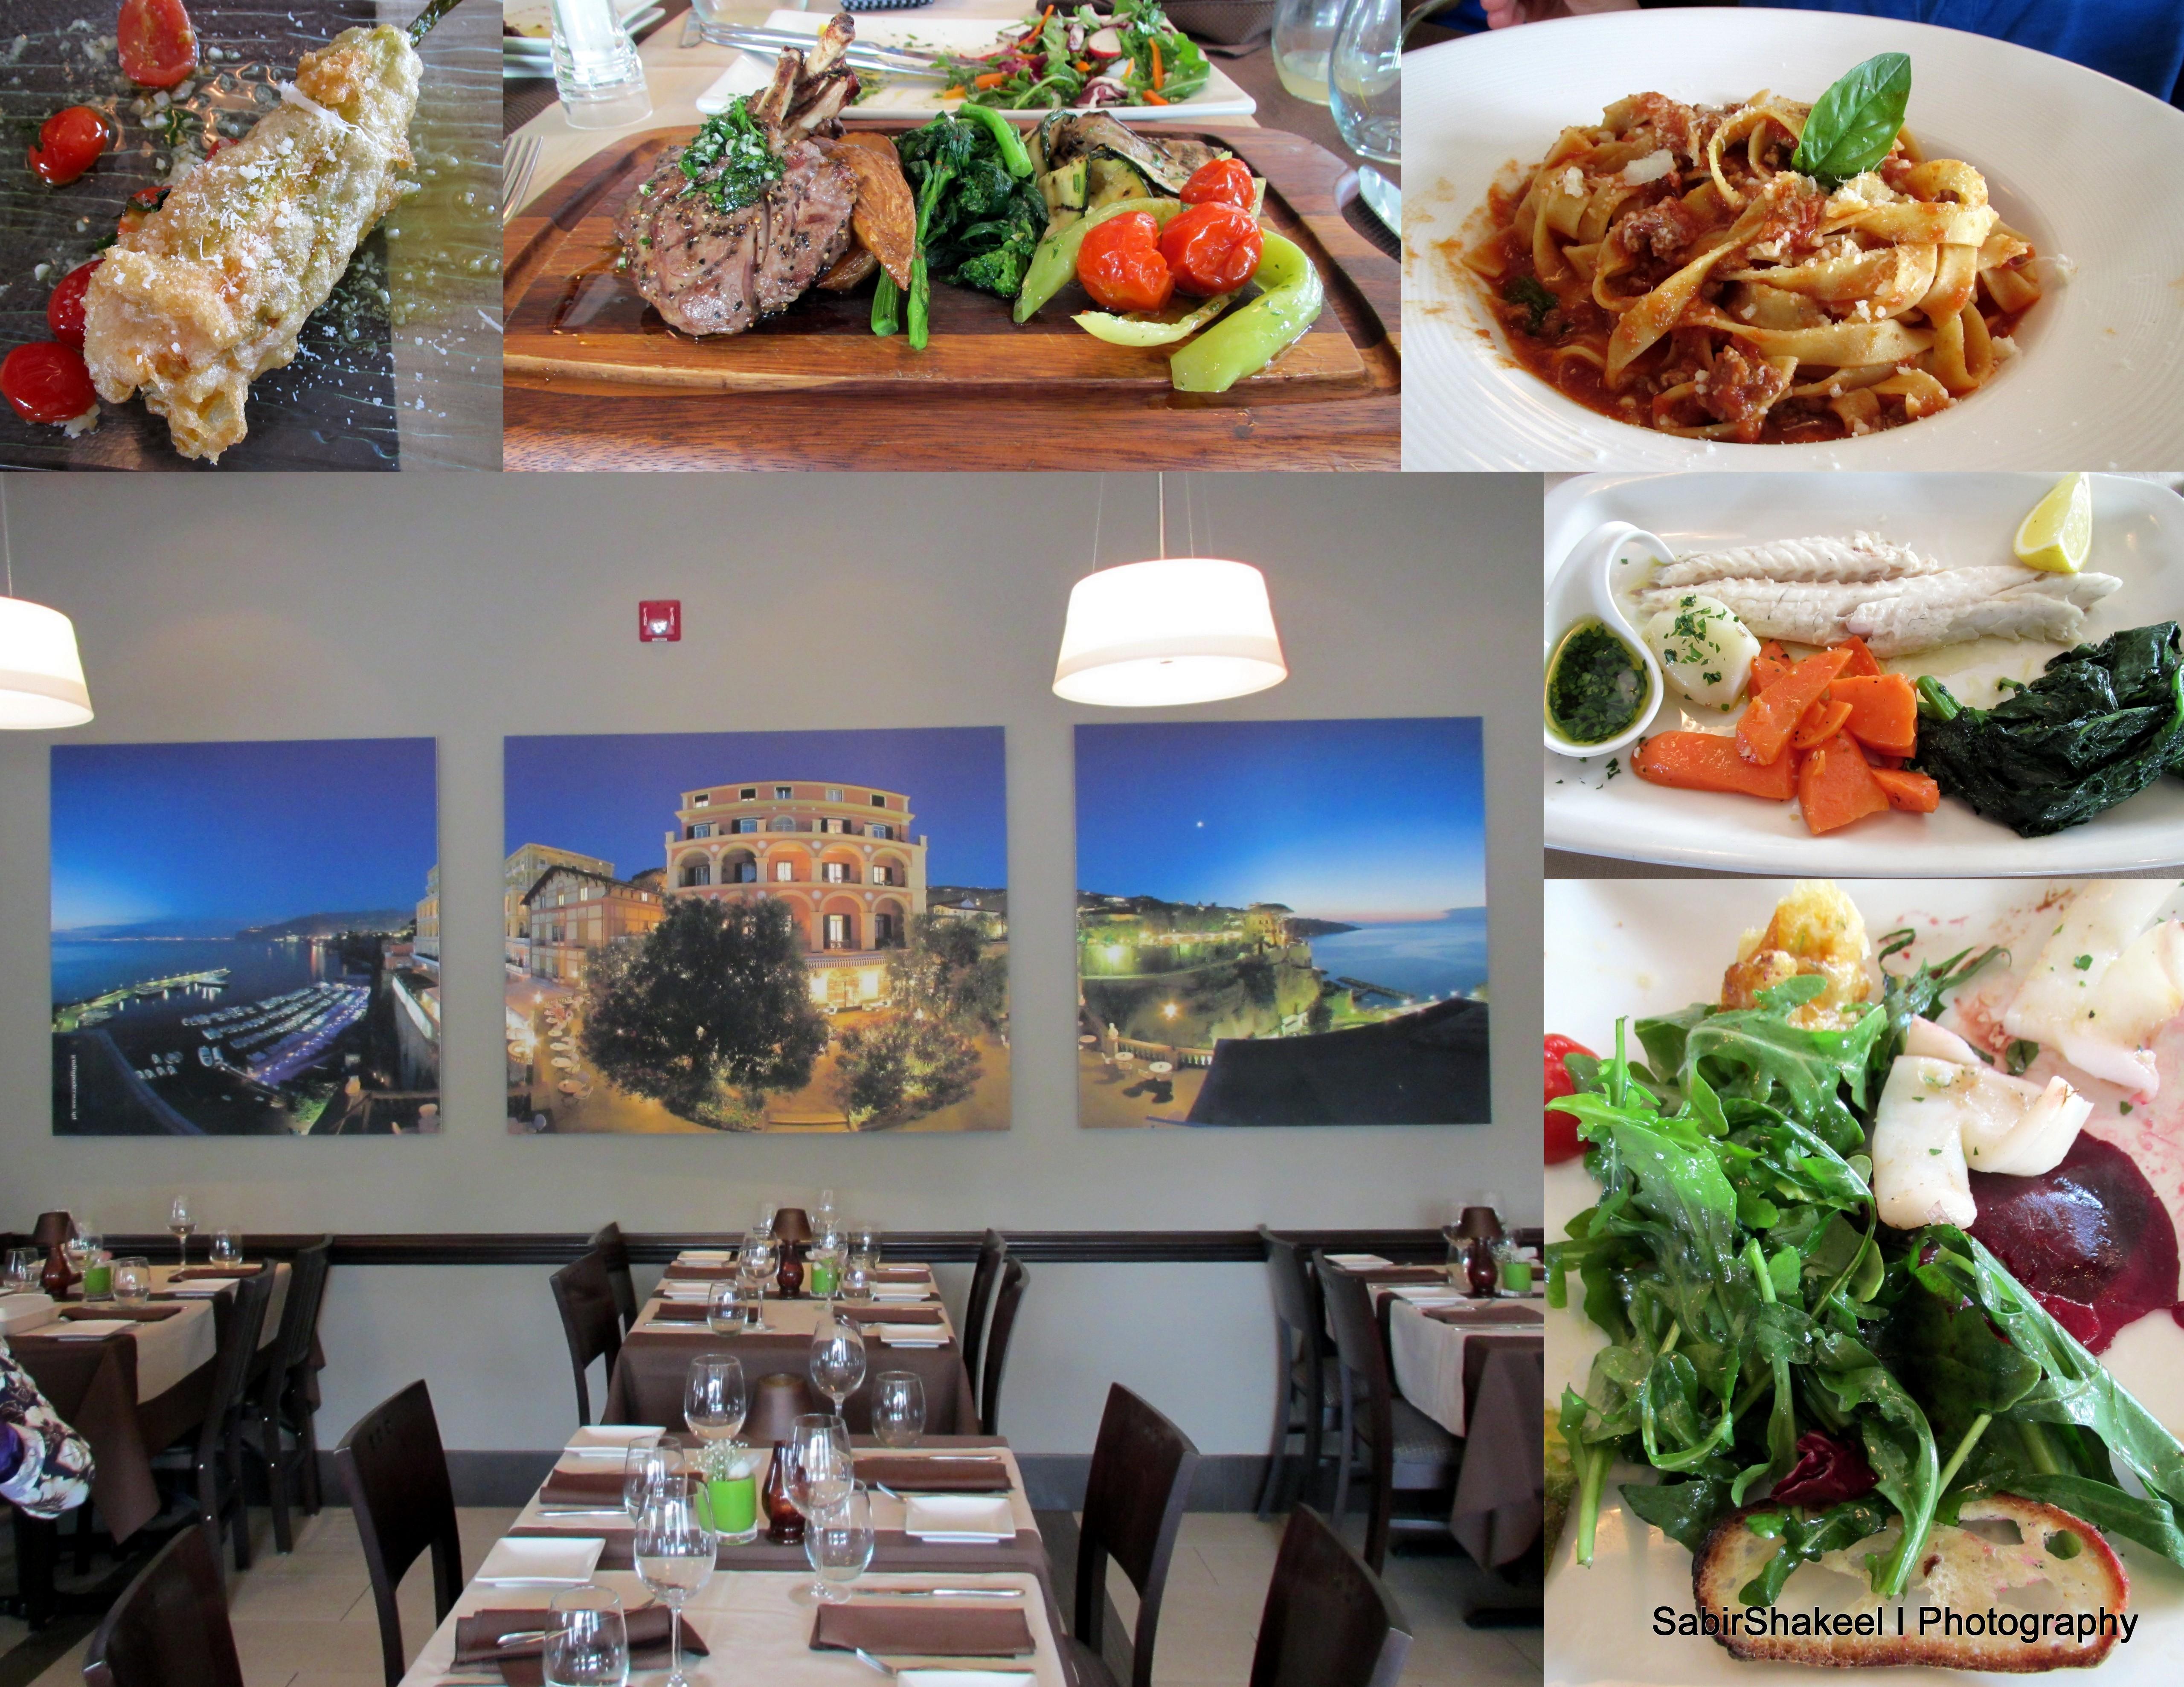 Wonderful Lunch Eid Al-Fitr Food - 2014-07-28-eid-al-fitr  Pictures_59100100 .jpg